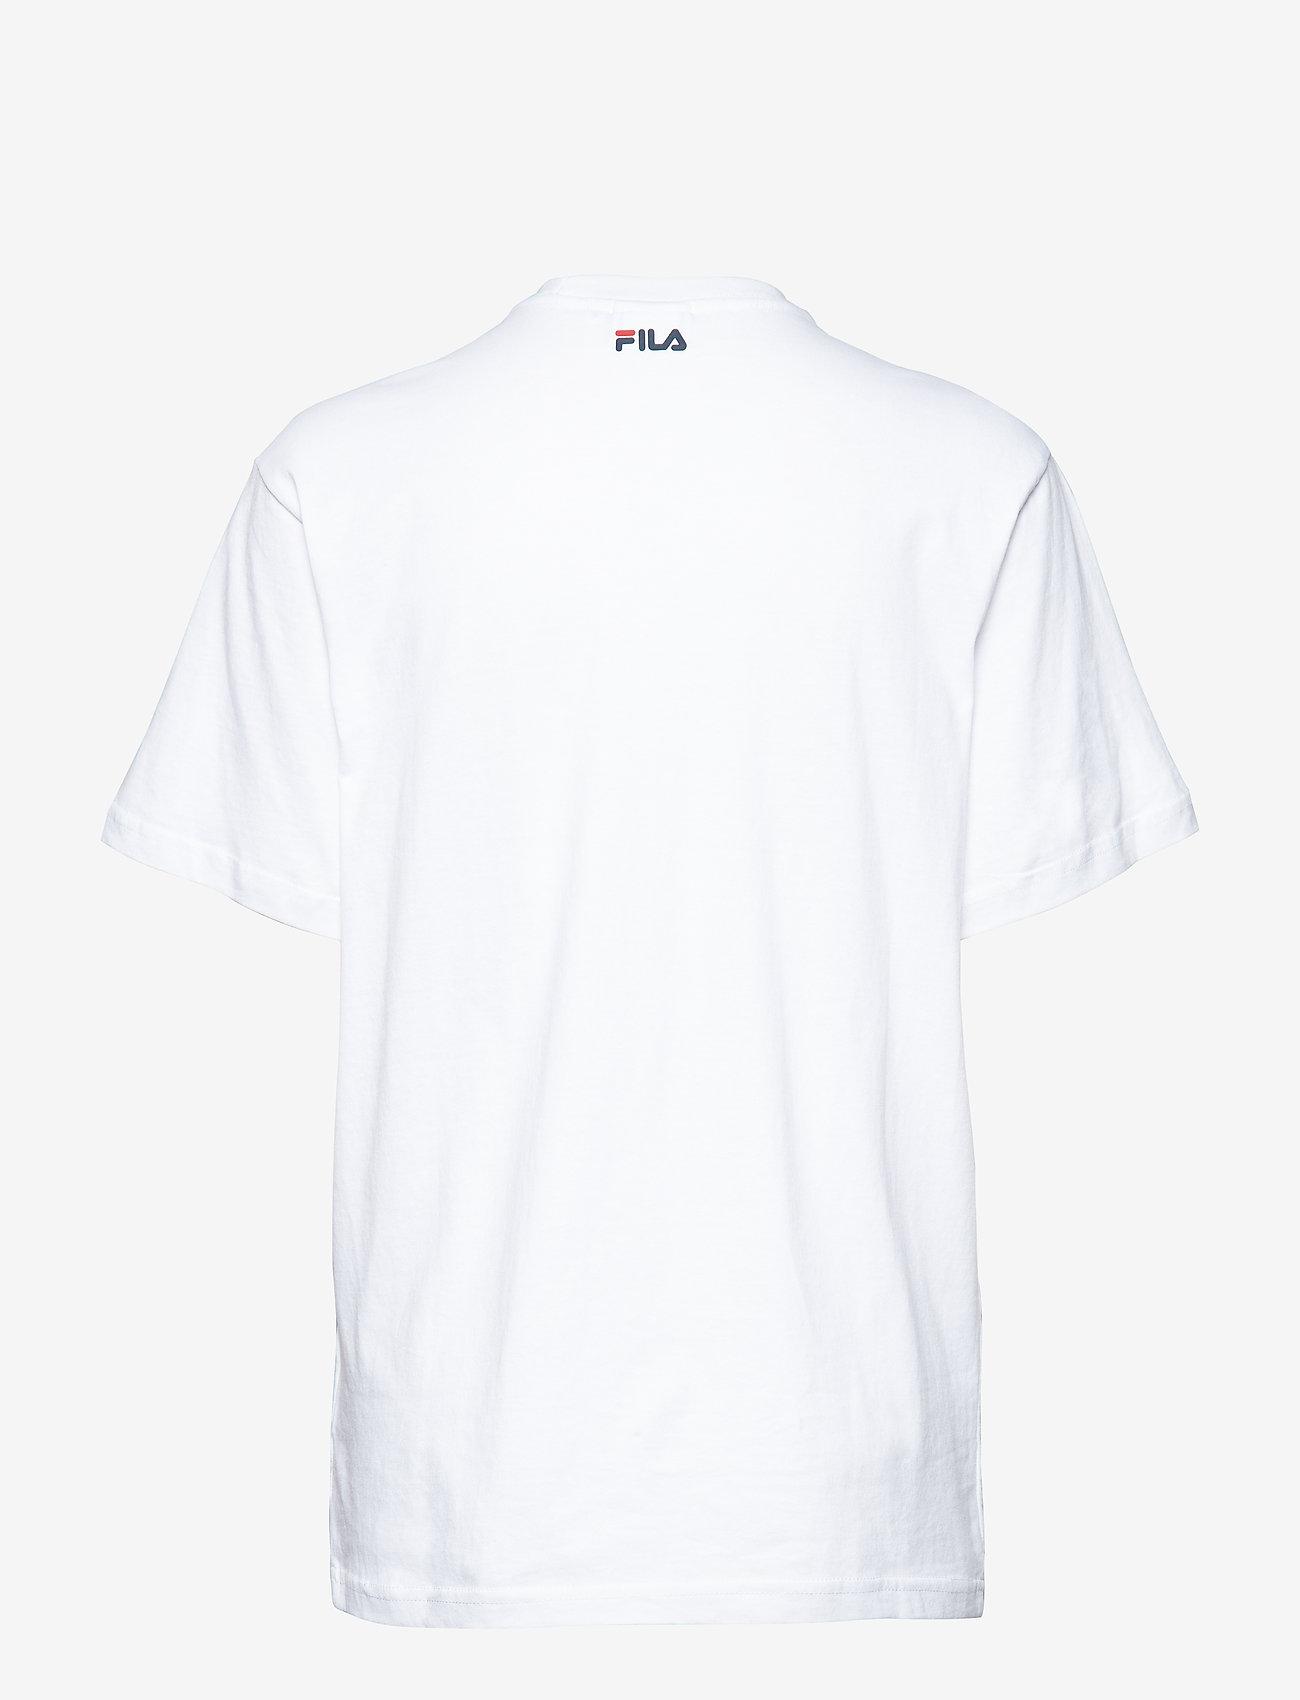 FILA - UNISEX CLASSIC PURE ss tee - t-shirts - bright white - 1